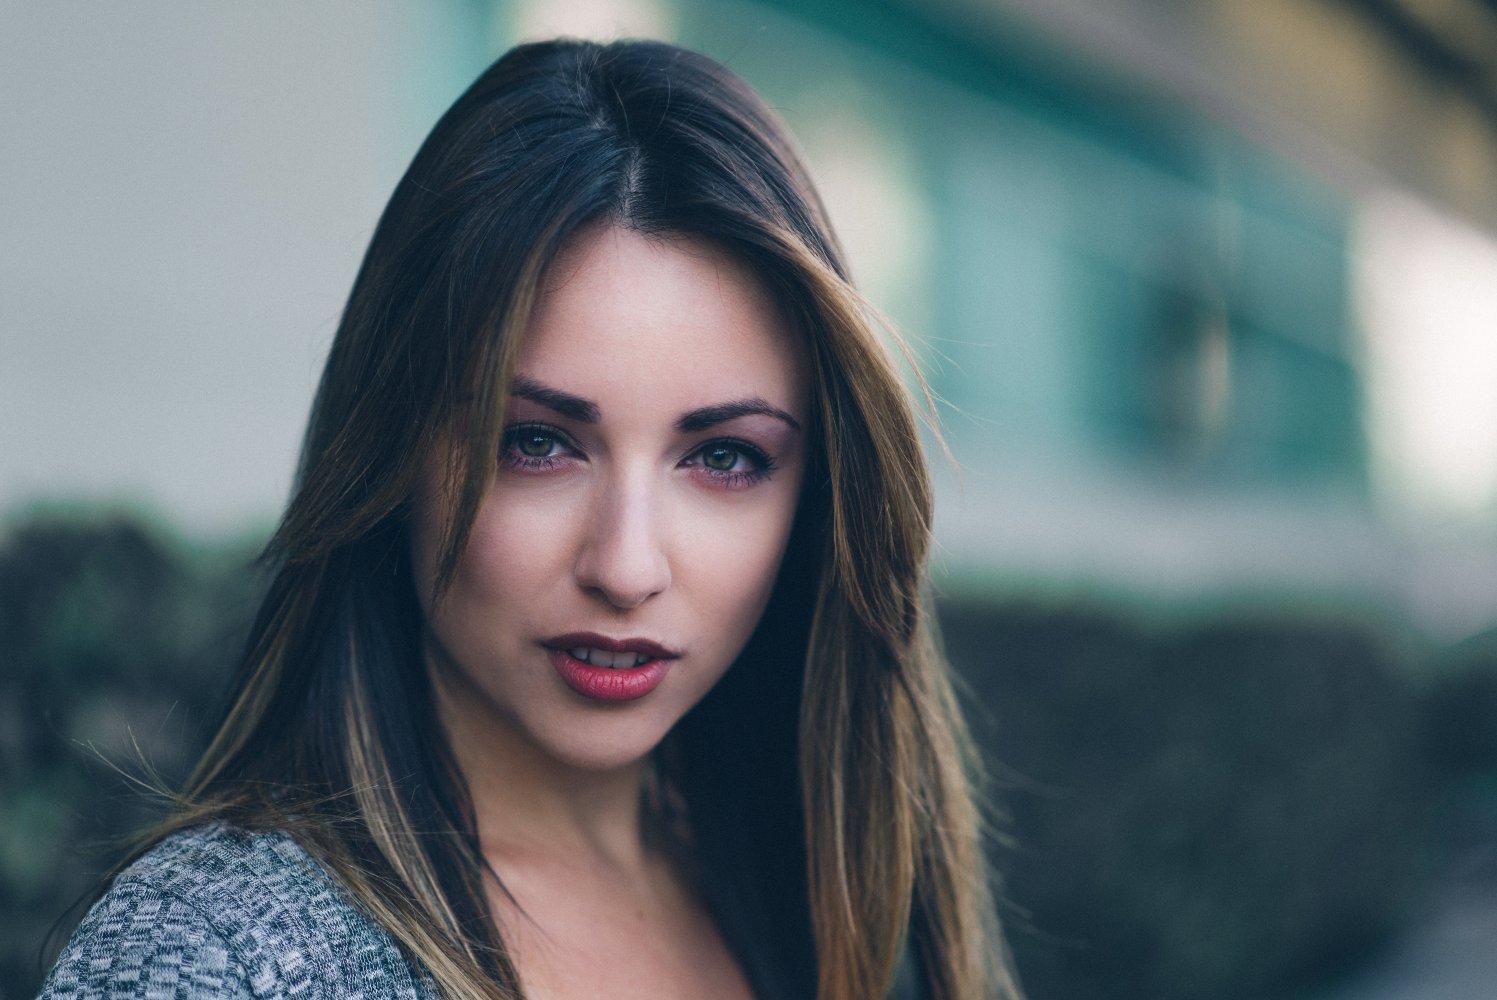 Nicola Posener